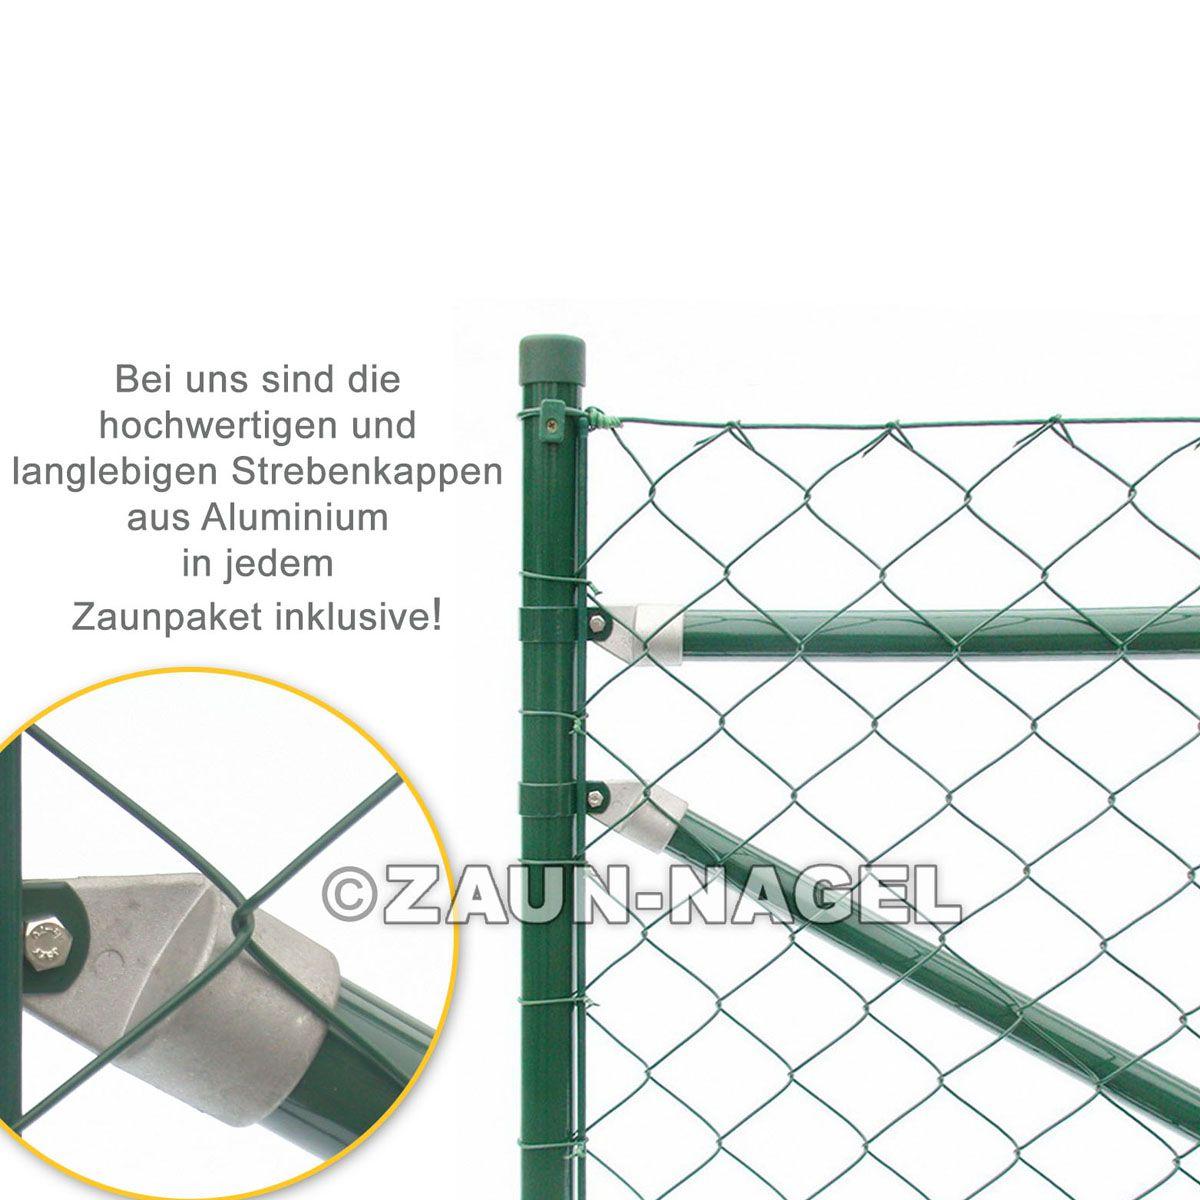 Zaun-Nagel - Maschendrahtzaun Set inkl. Lochspaten